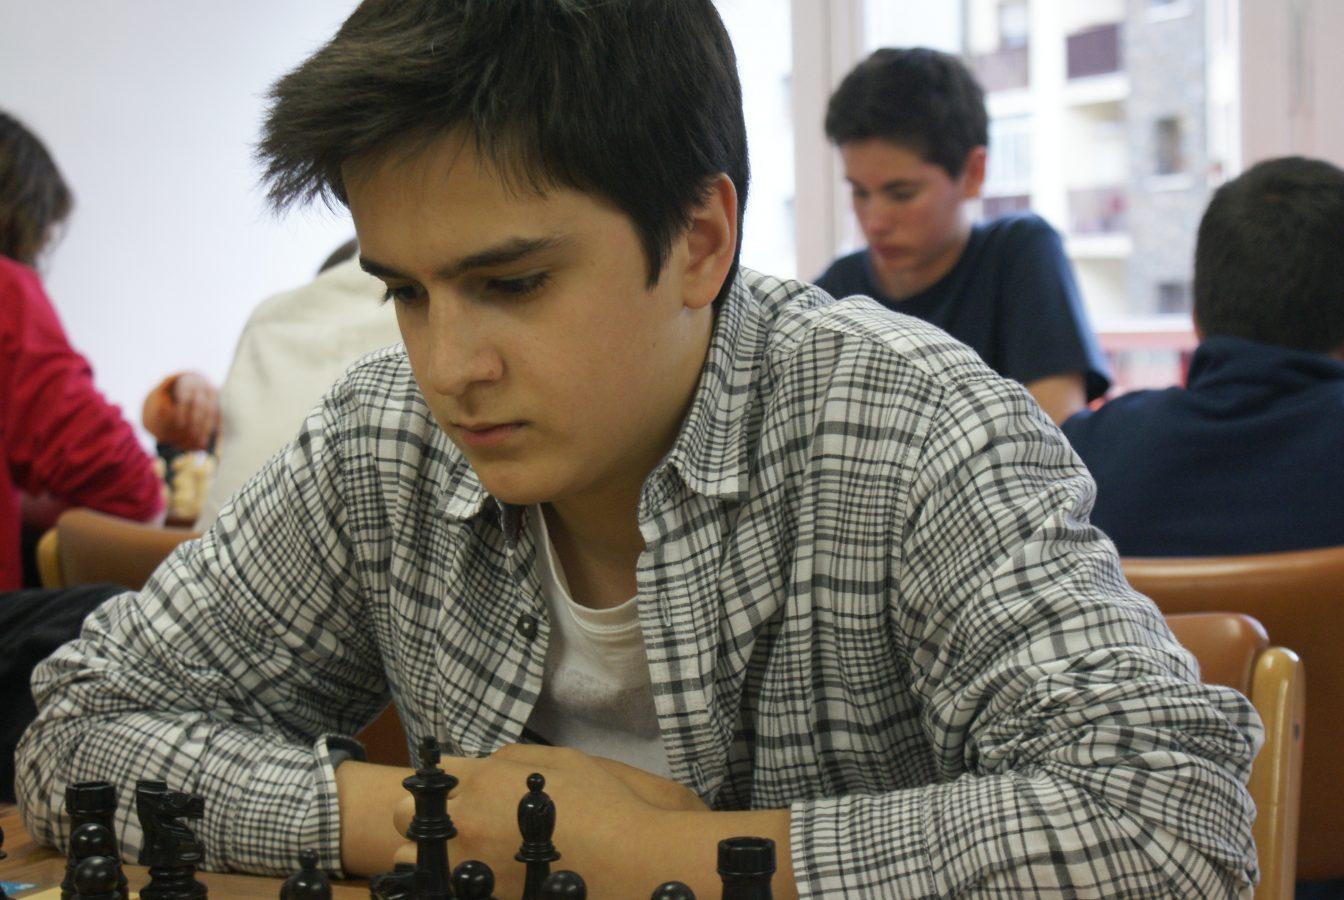 Campionat Social GEVA-CEA 2012 – Bases